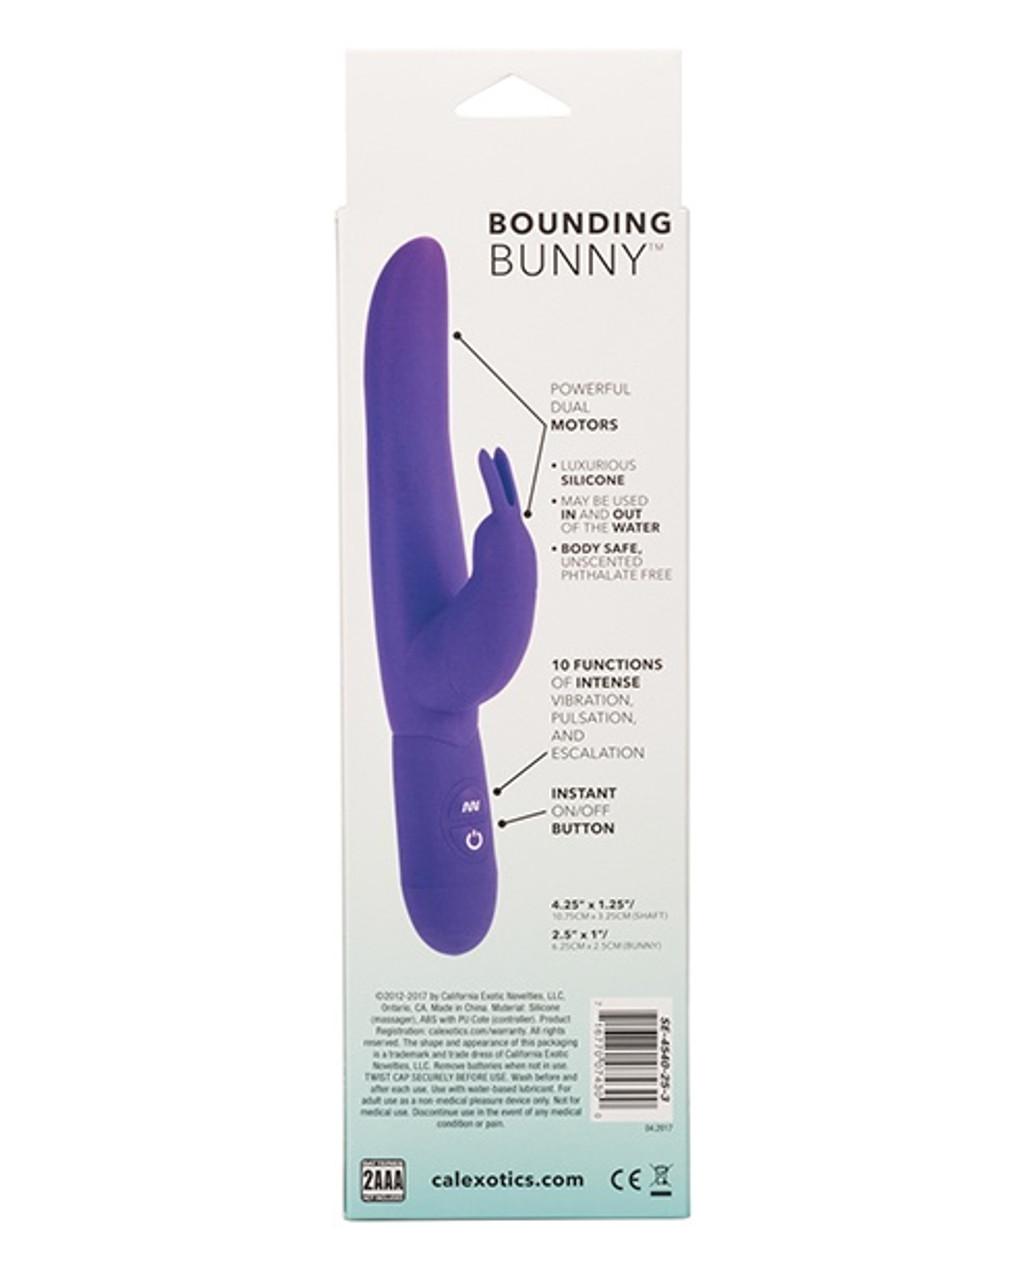 CalExotics Bounding Bunny